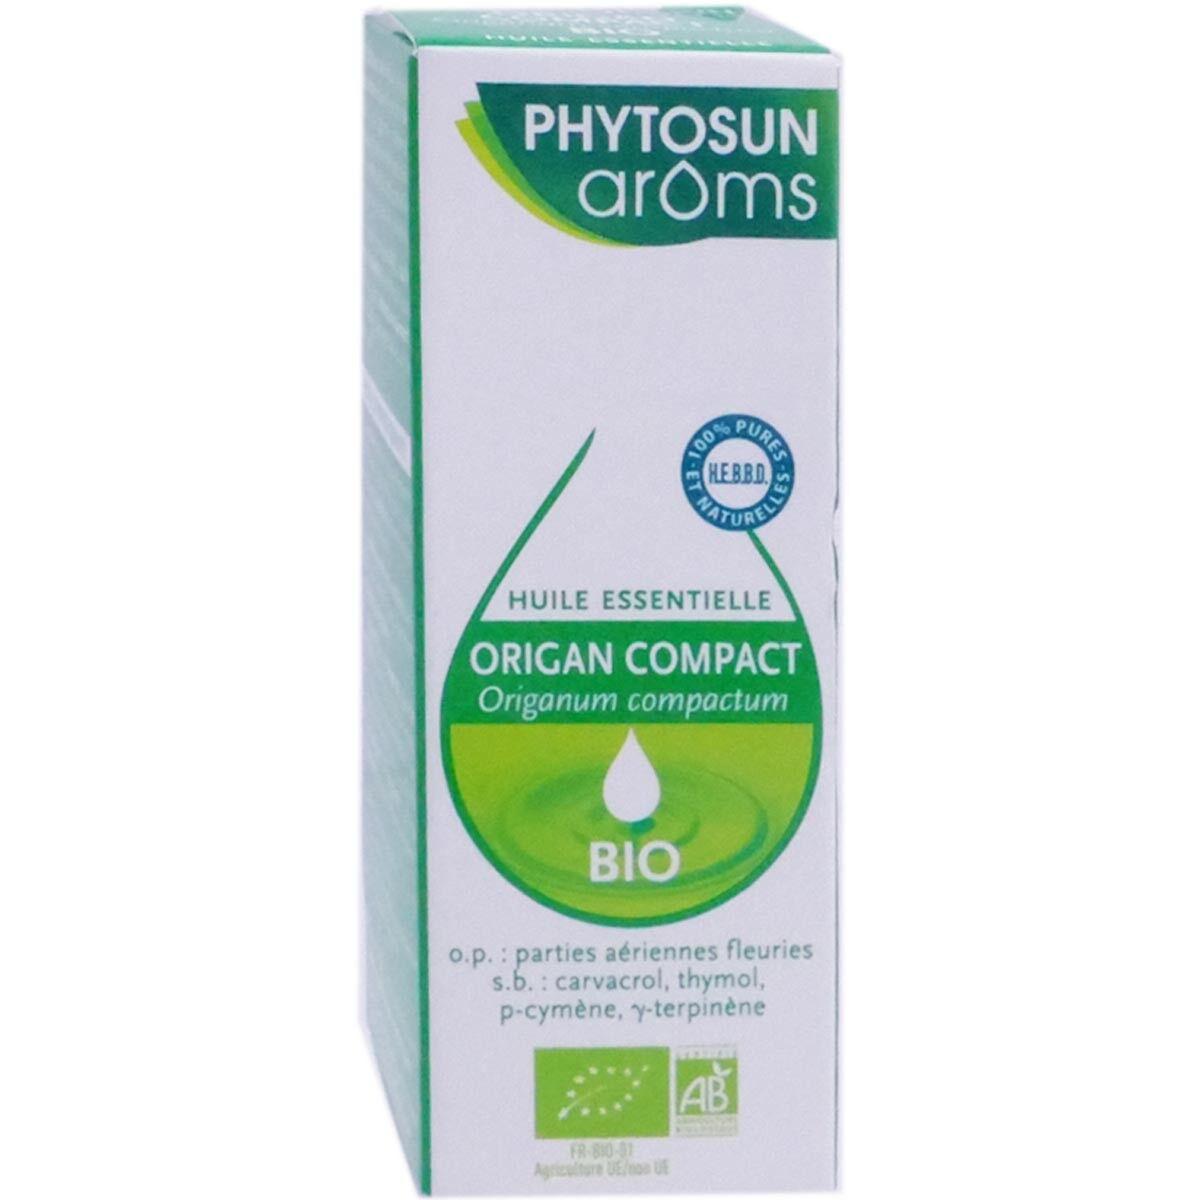 PHYTOSUN AROMS Phytosun  aroms huile essentielle origan compact bio 10ml